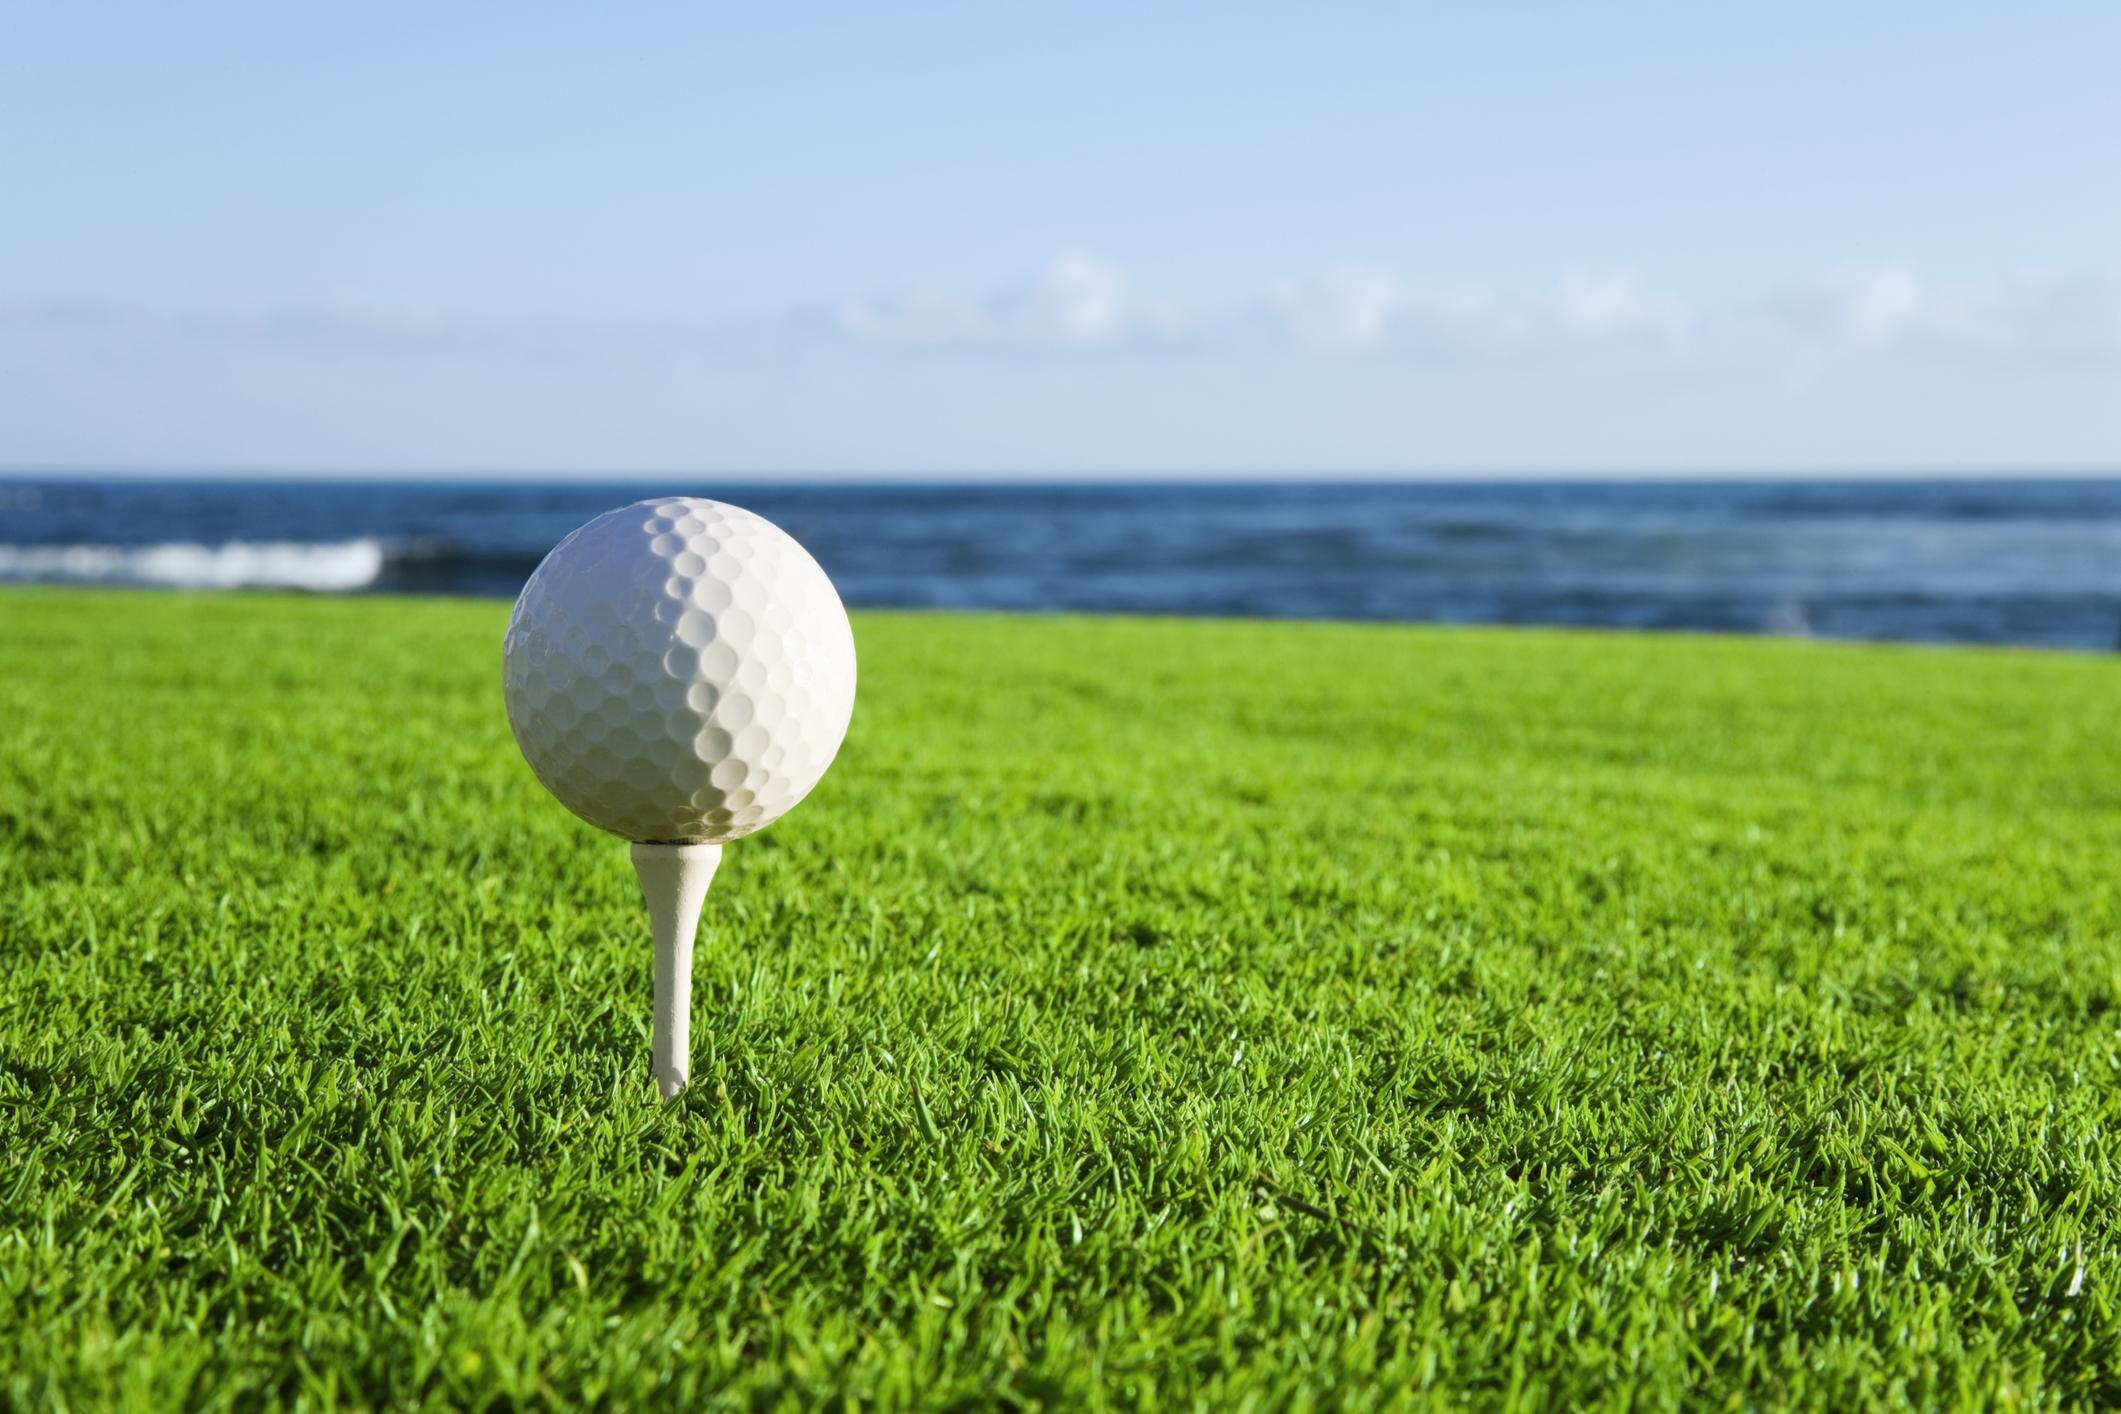 Golf ball on a tee by the ocean.